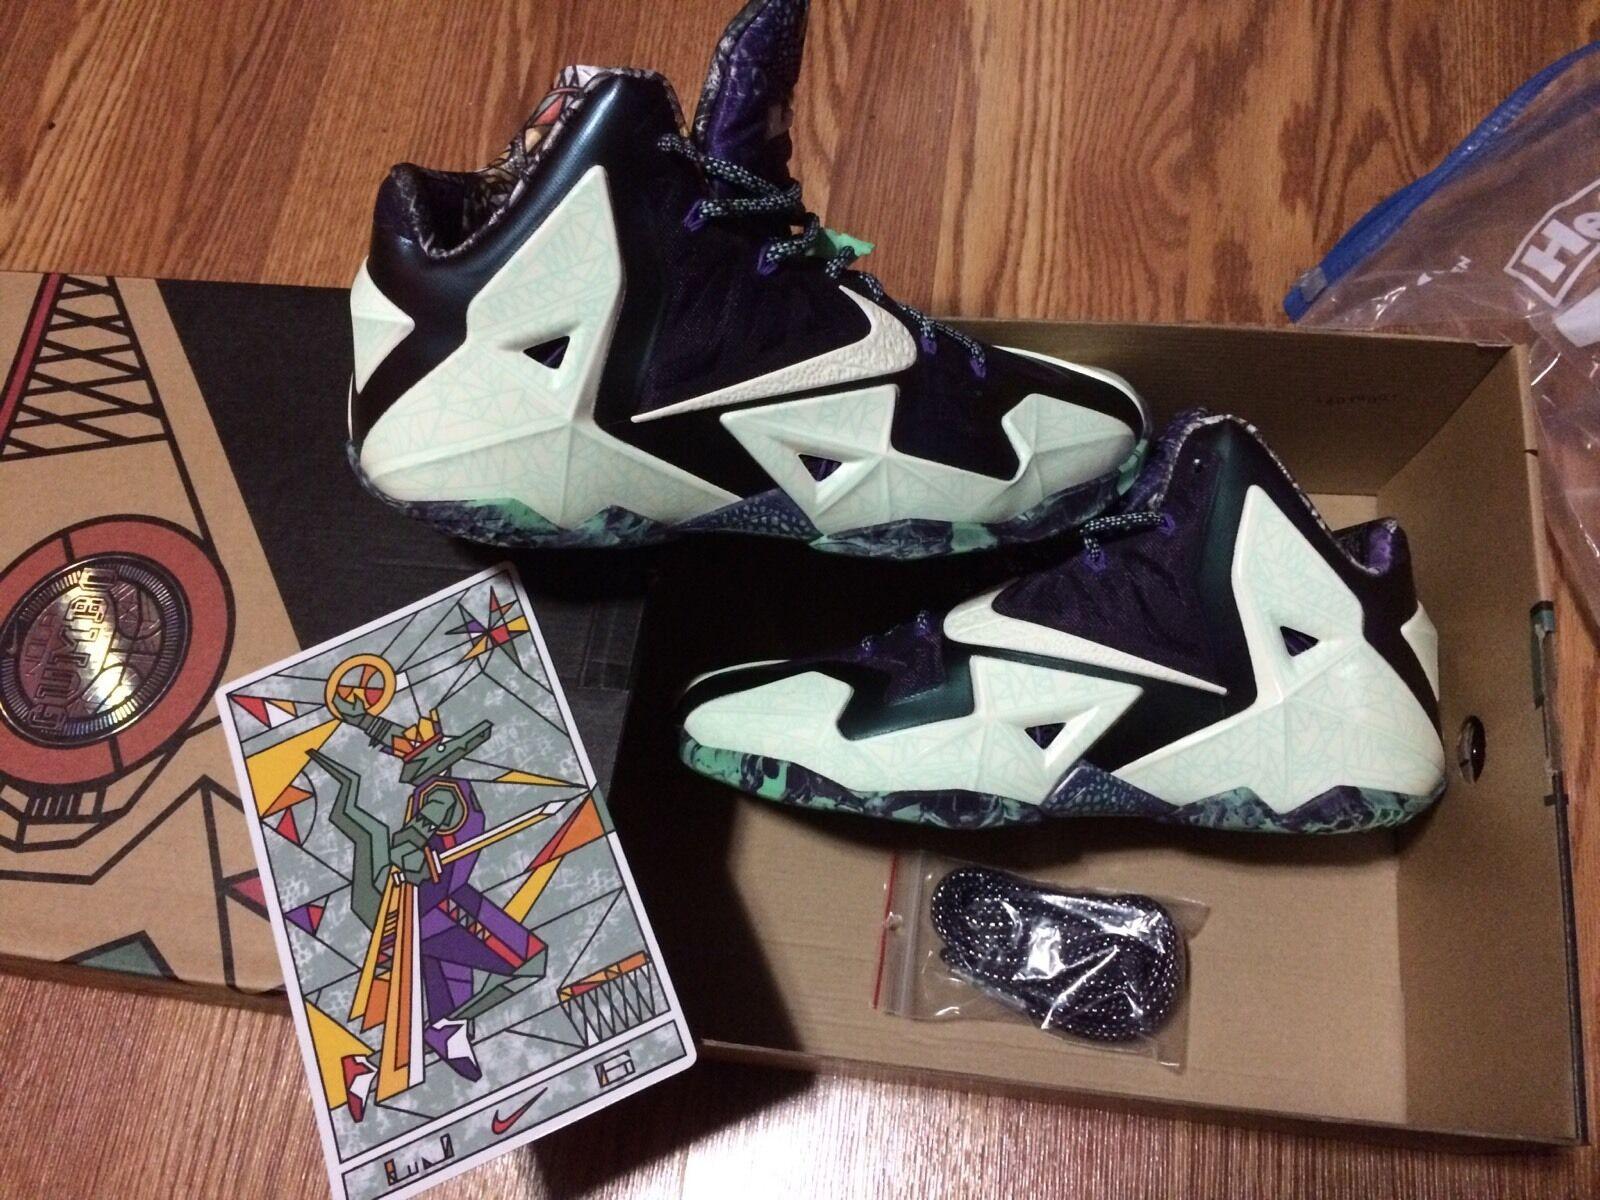 Nike Lebron Xi 11 All Star Gumbo Sz 12 cc8c0zbpx65840